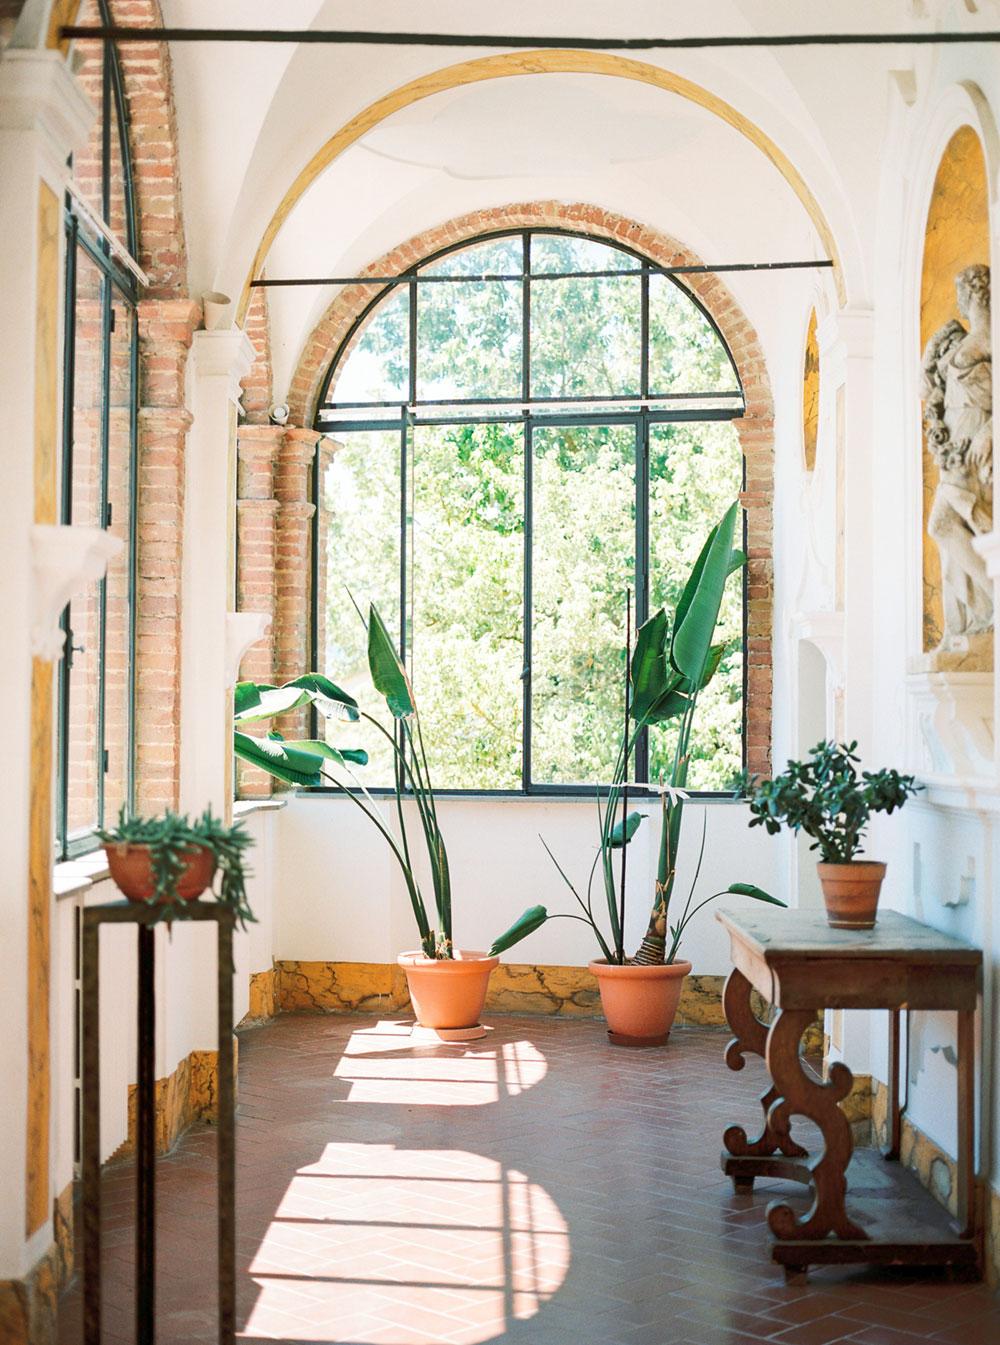 Linari-Tuscany-Elopement-Courtney-Michaela-123